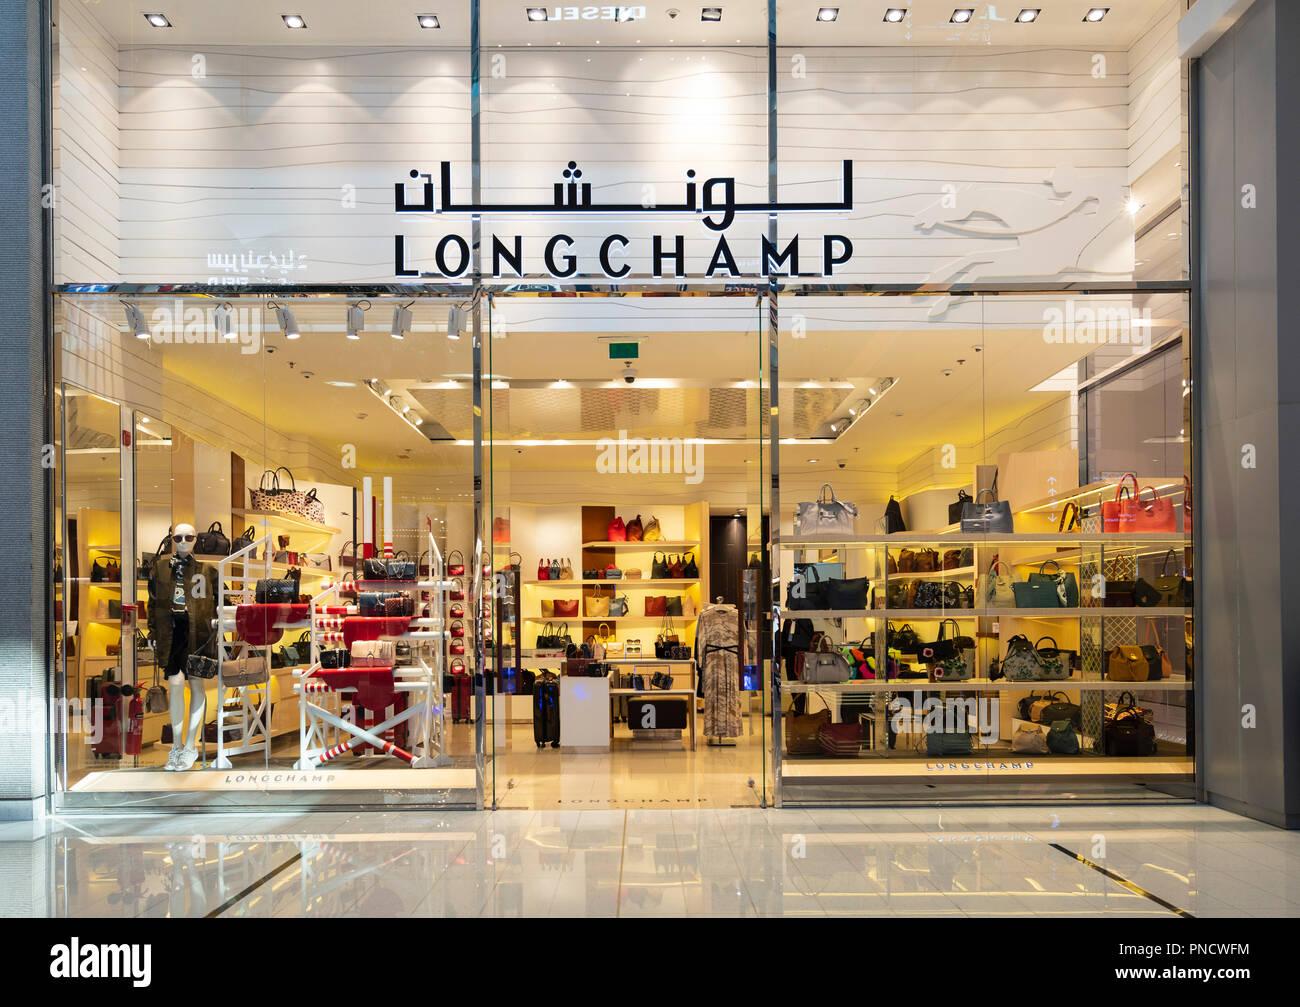 b37211ef7ce Longchamp Store Stock Photos & Longchamp Store Stock Images - Alamy